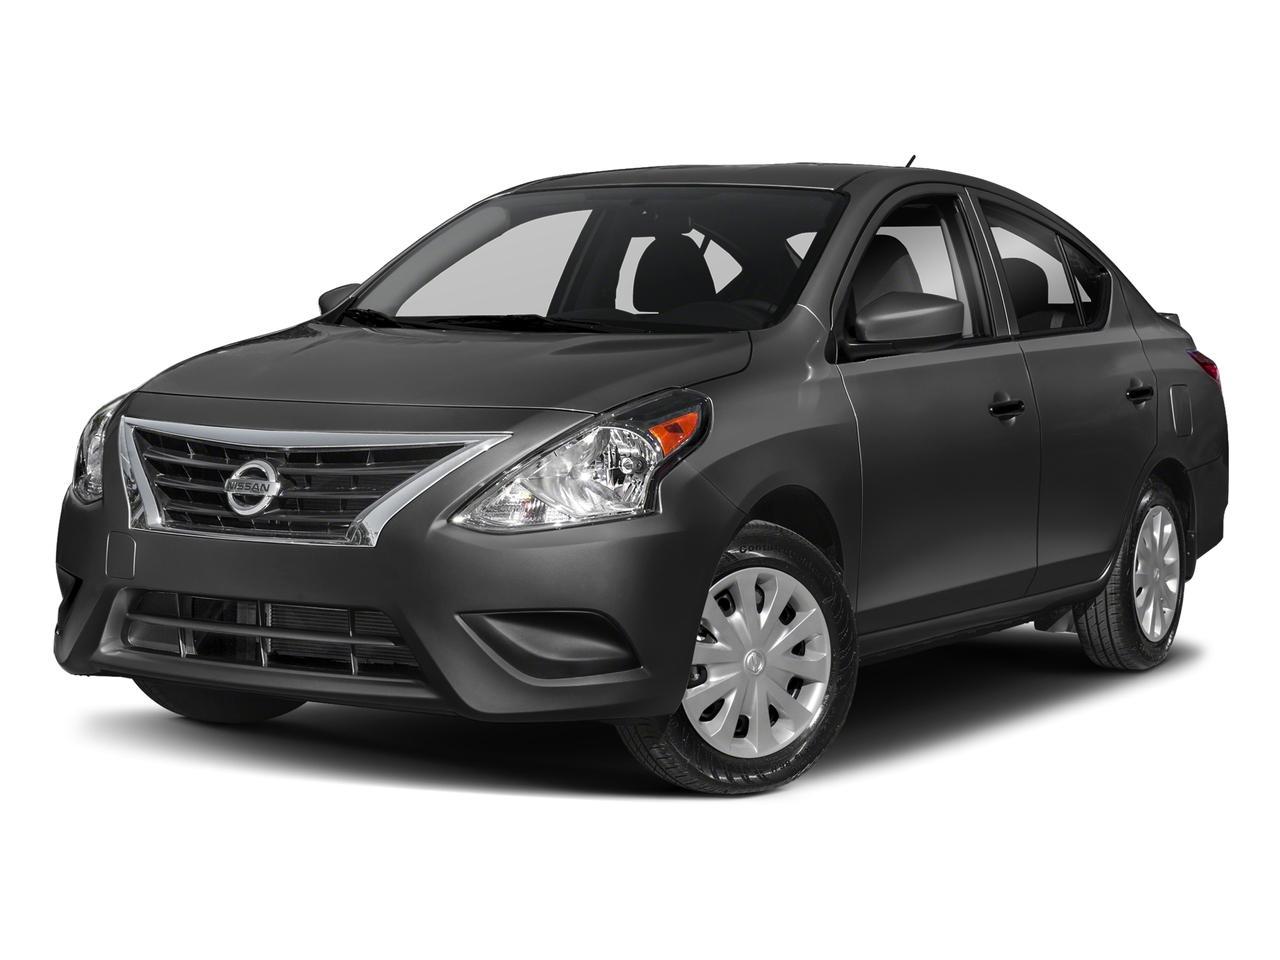 2018 Nissan Versa Sedan Vehicle Photo in Neenah, WI 54956